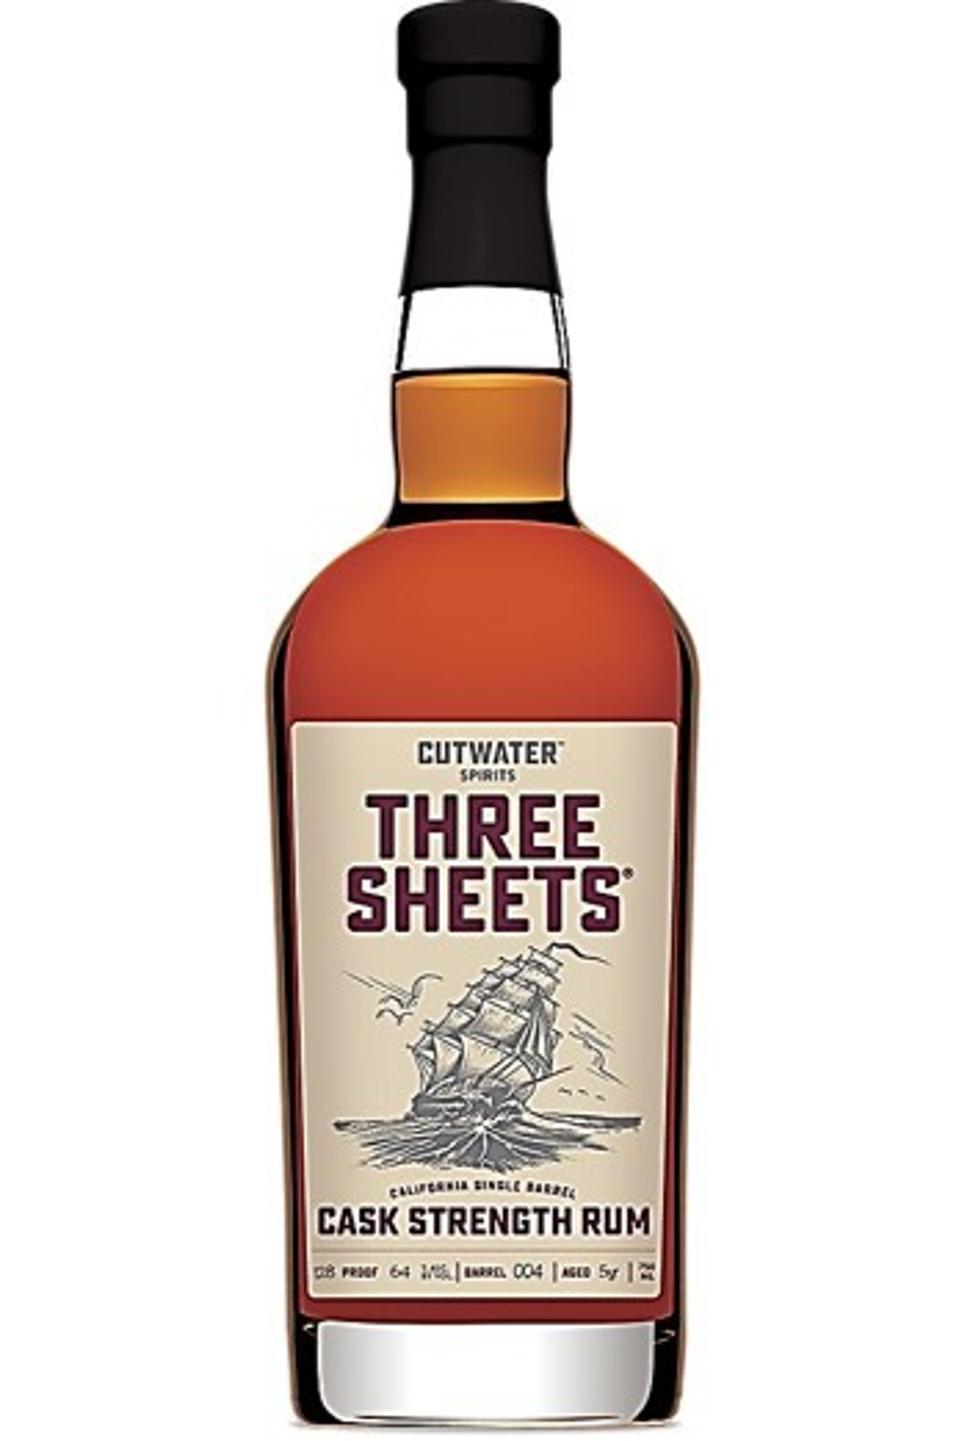 Cutwater Spirits, Three Sheets, Cask Strength Rum